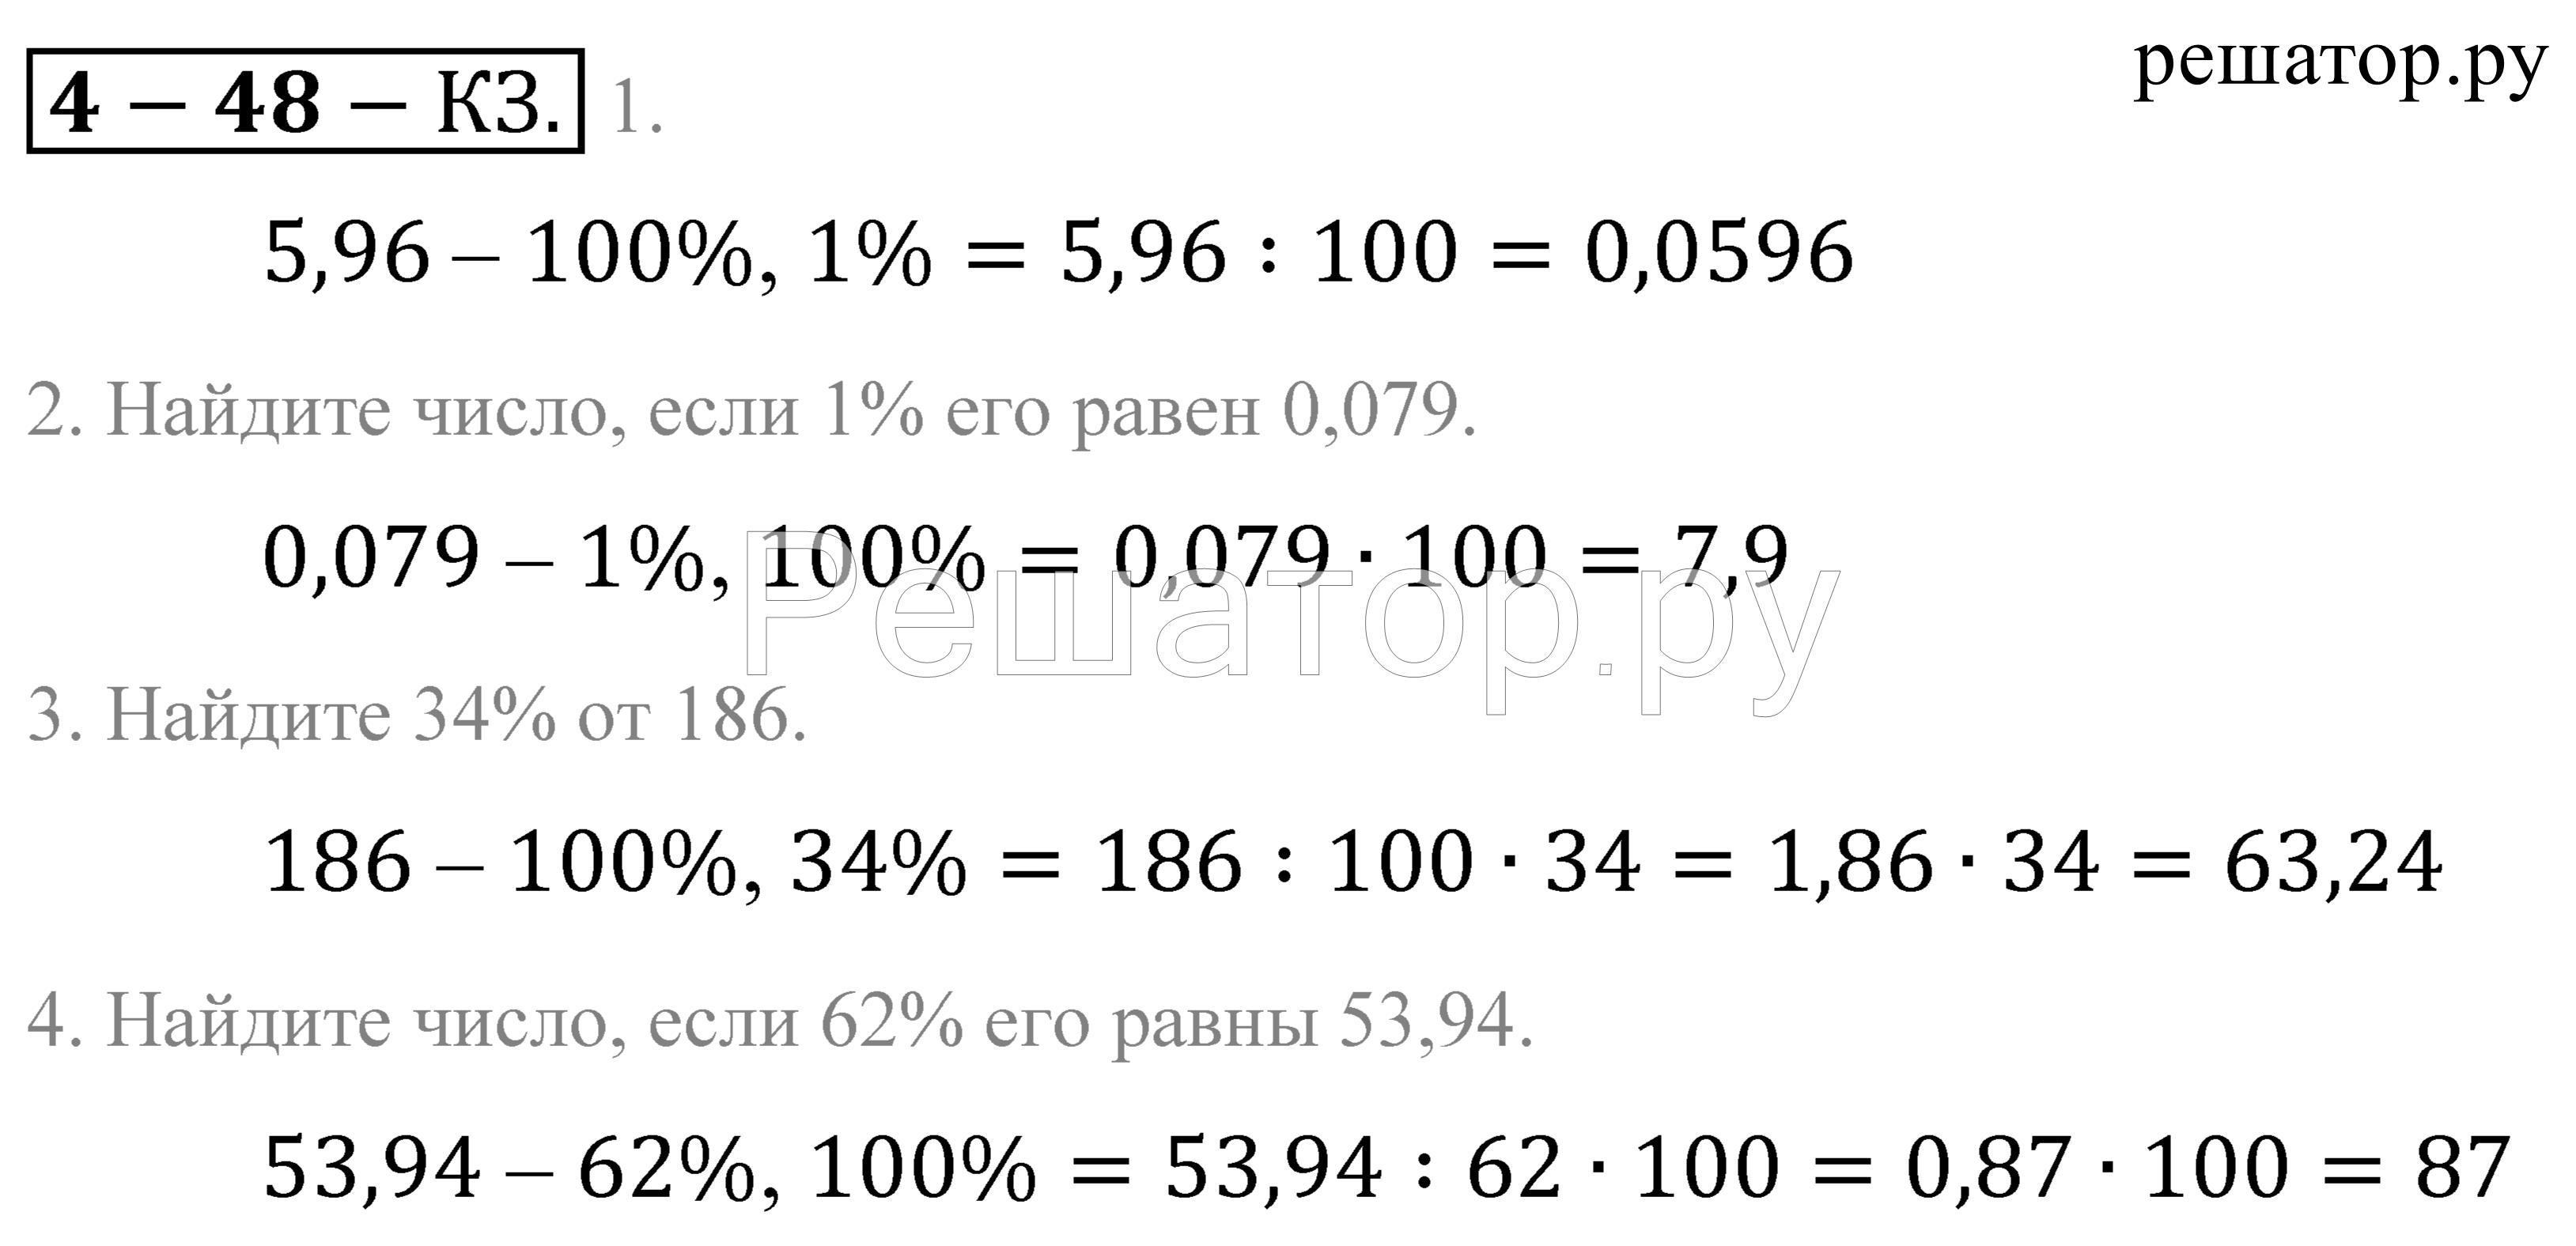 гдз 7 класс алгебра задачи на проценты